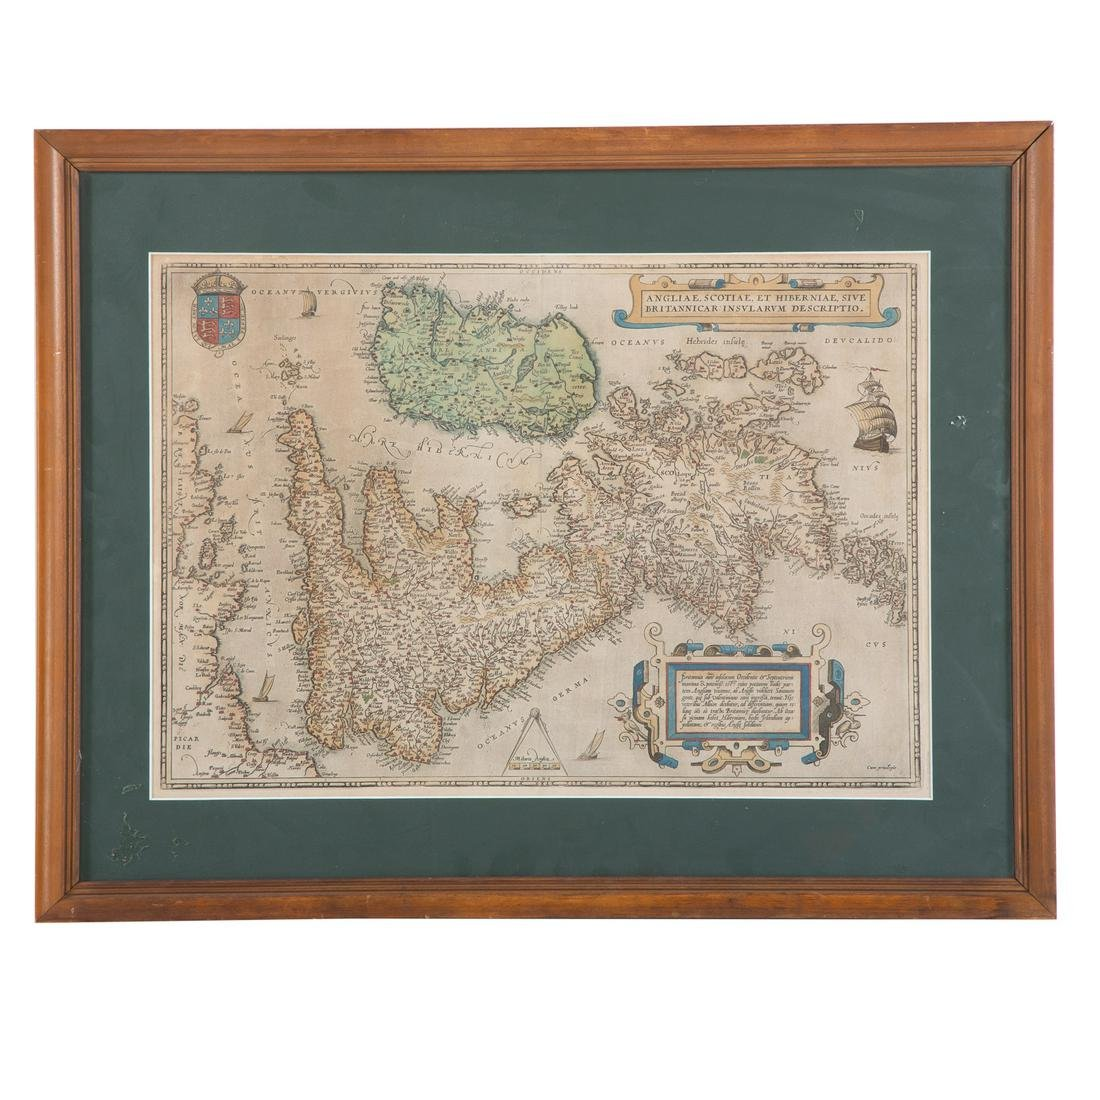 Angliae, Scotiae, Et Hiberniae Map